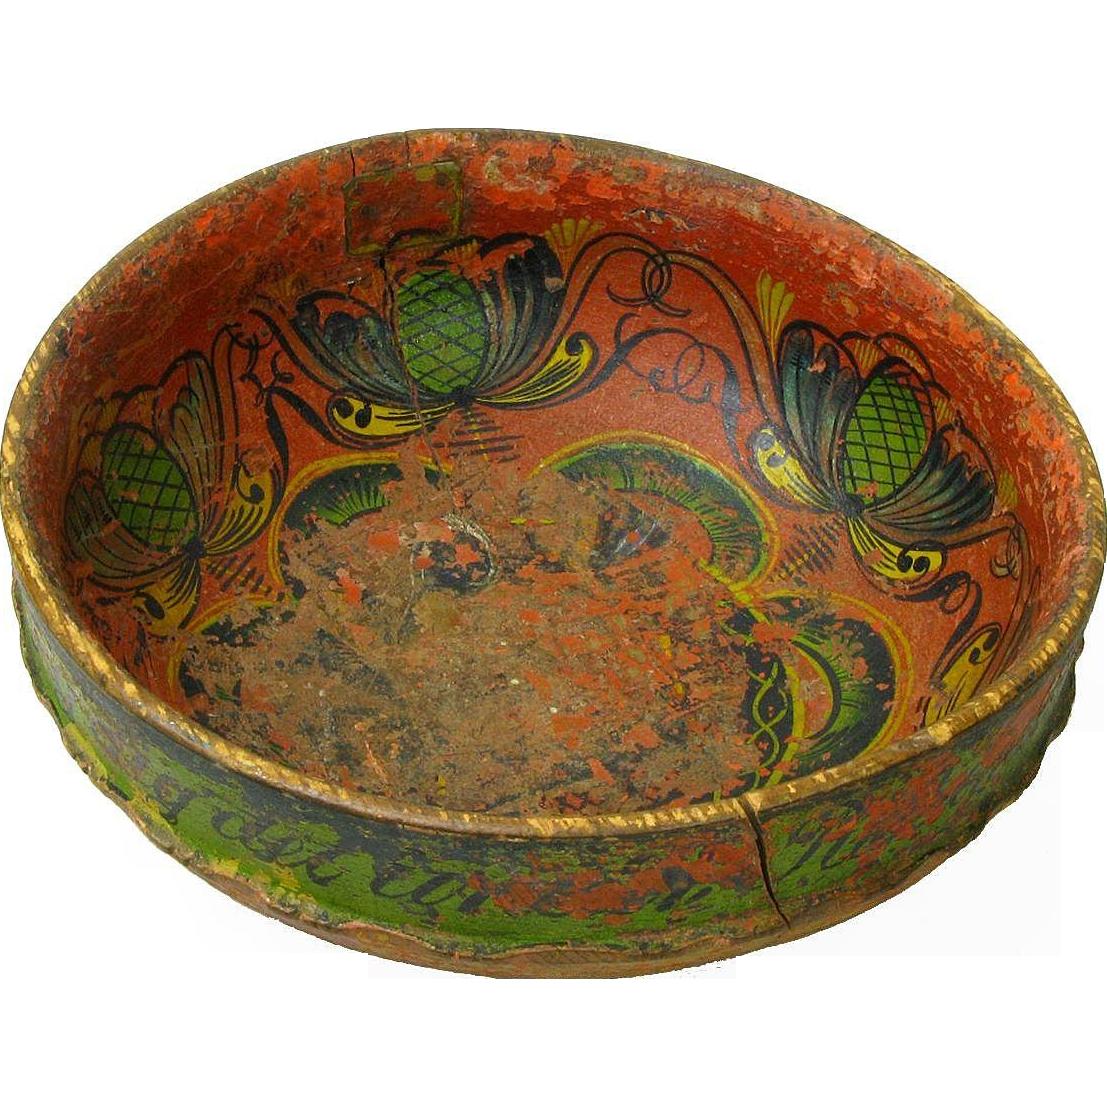 Norwegian Telemark Rosemaling Decorated Ale Bowl, Dated 1868